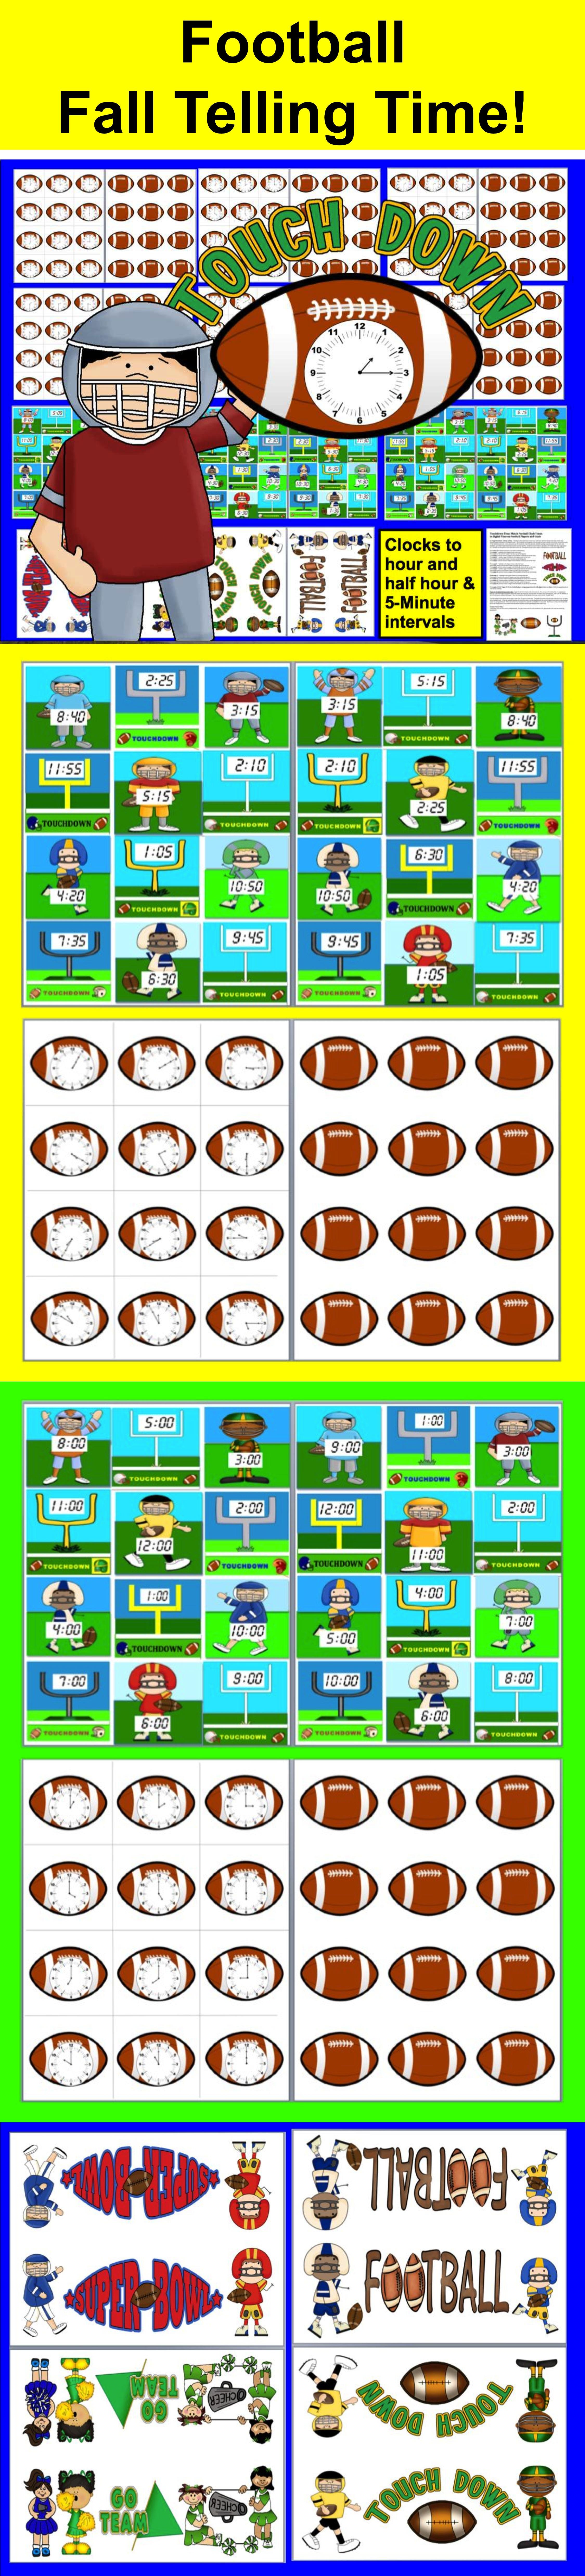 Ultimate Youth Football Playbook — Football Tutorials